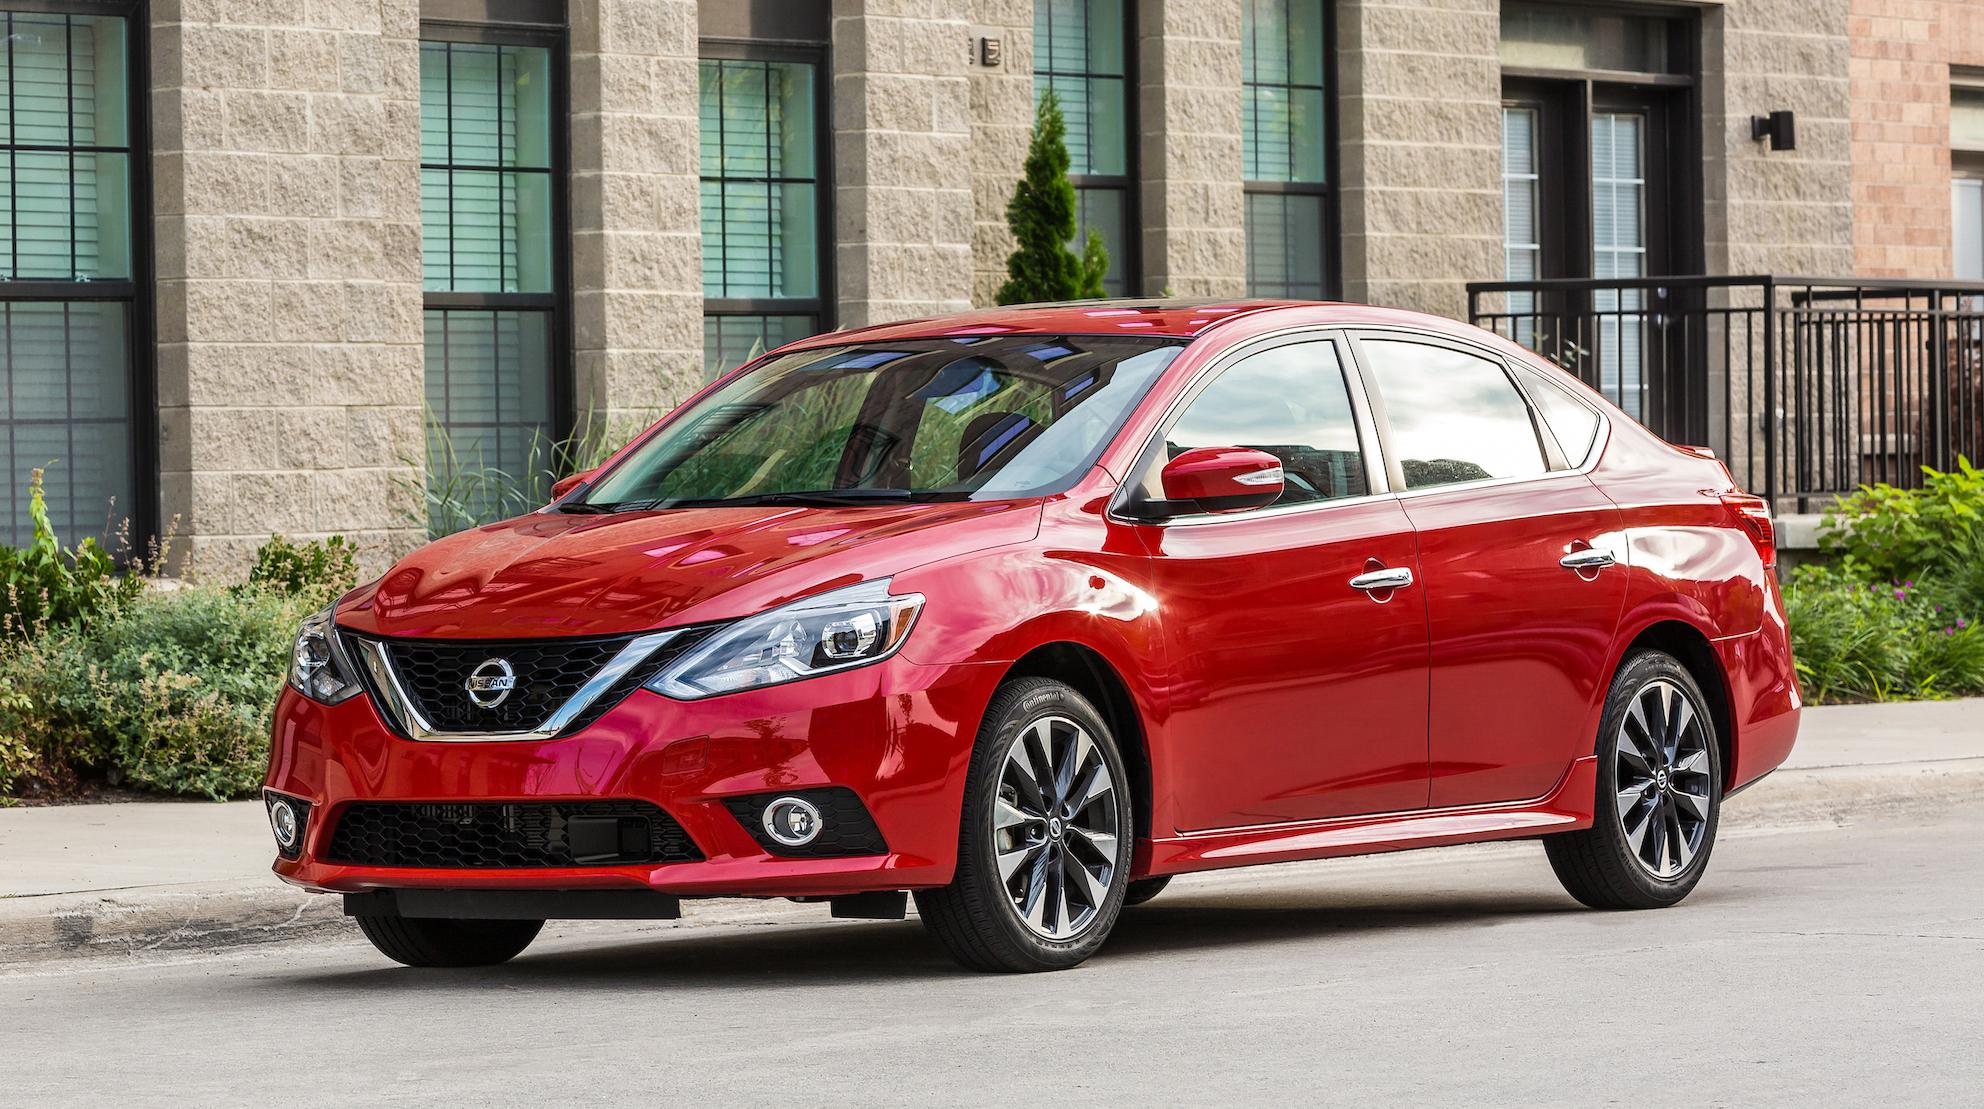 A red Nissan Sentra, a compact sedan.